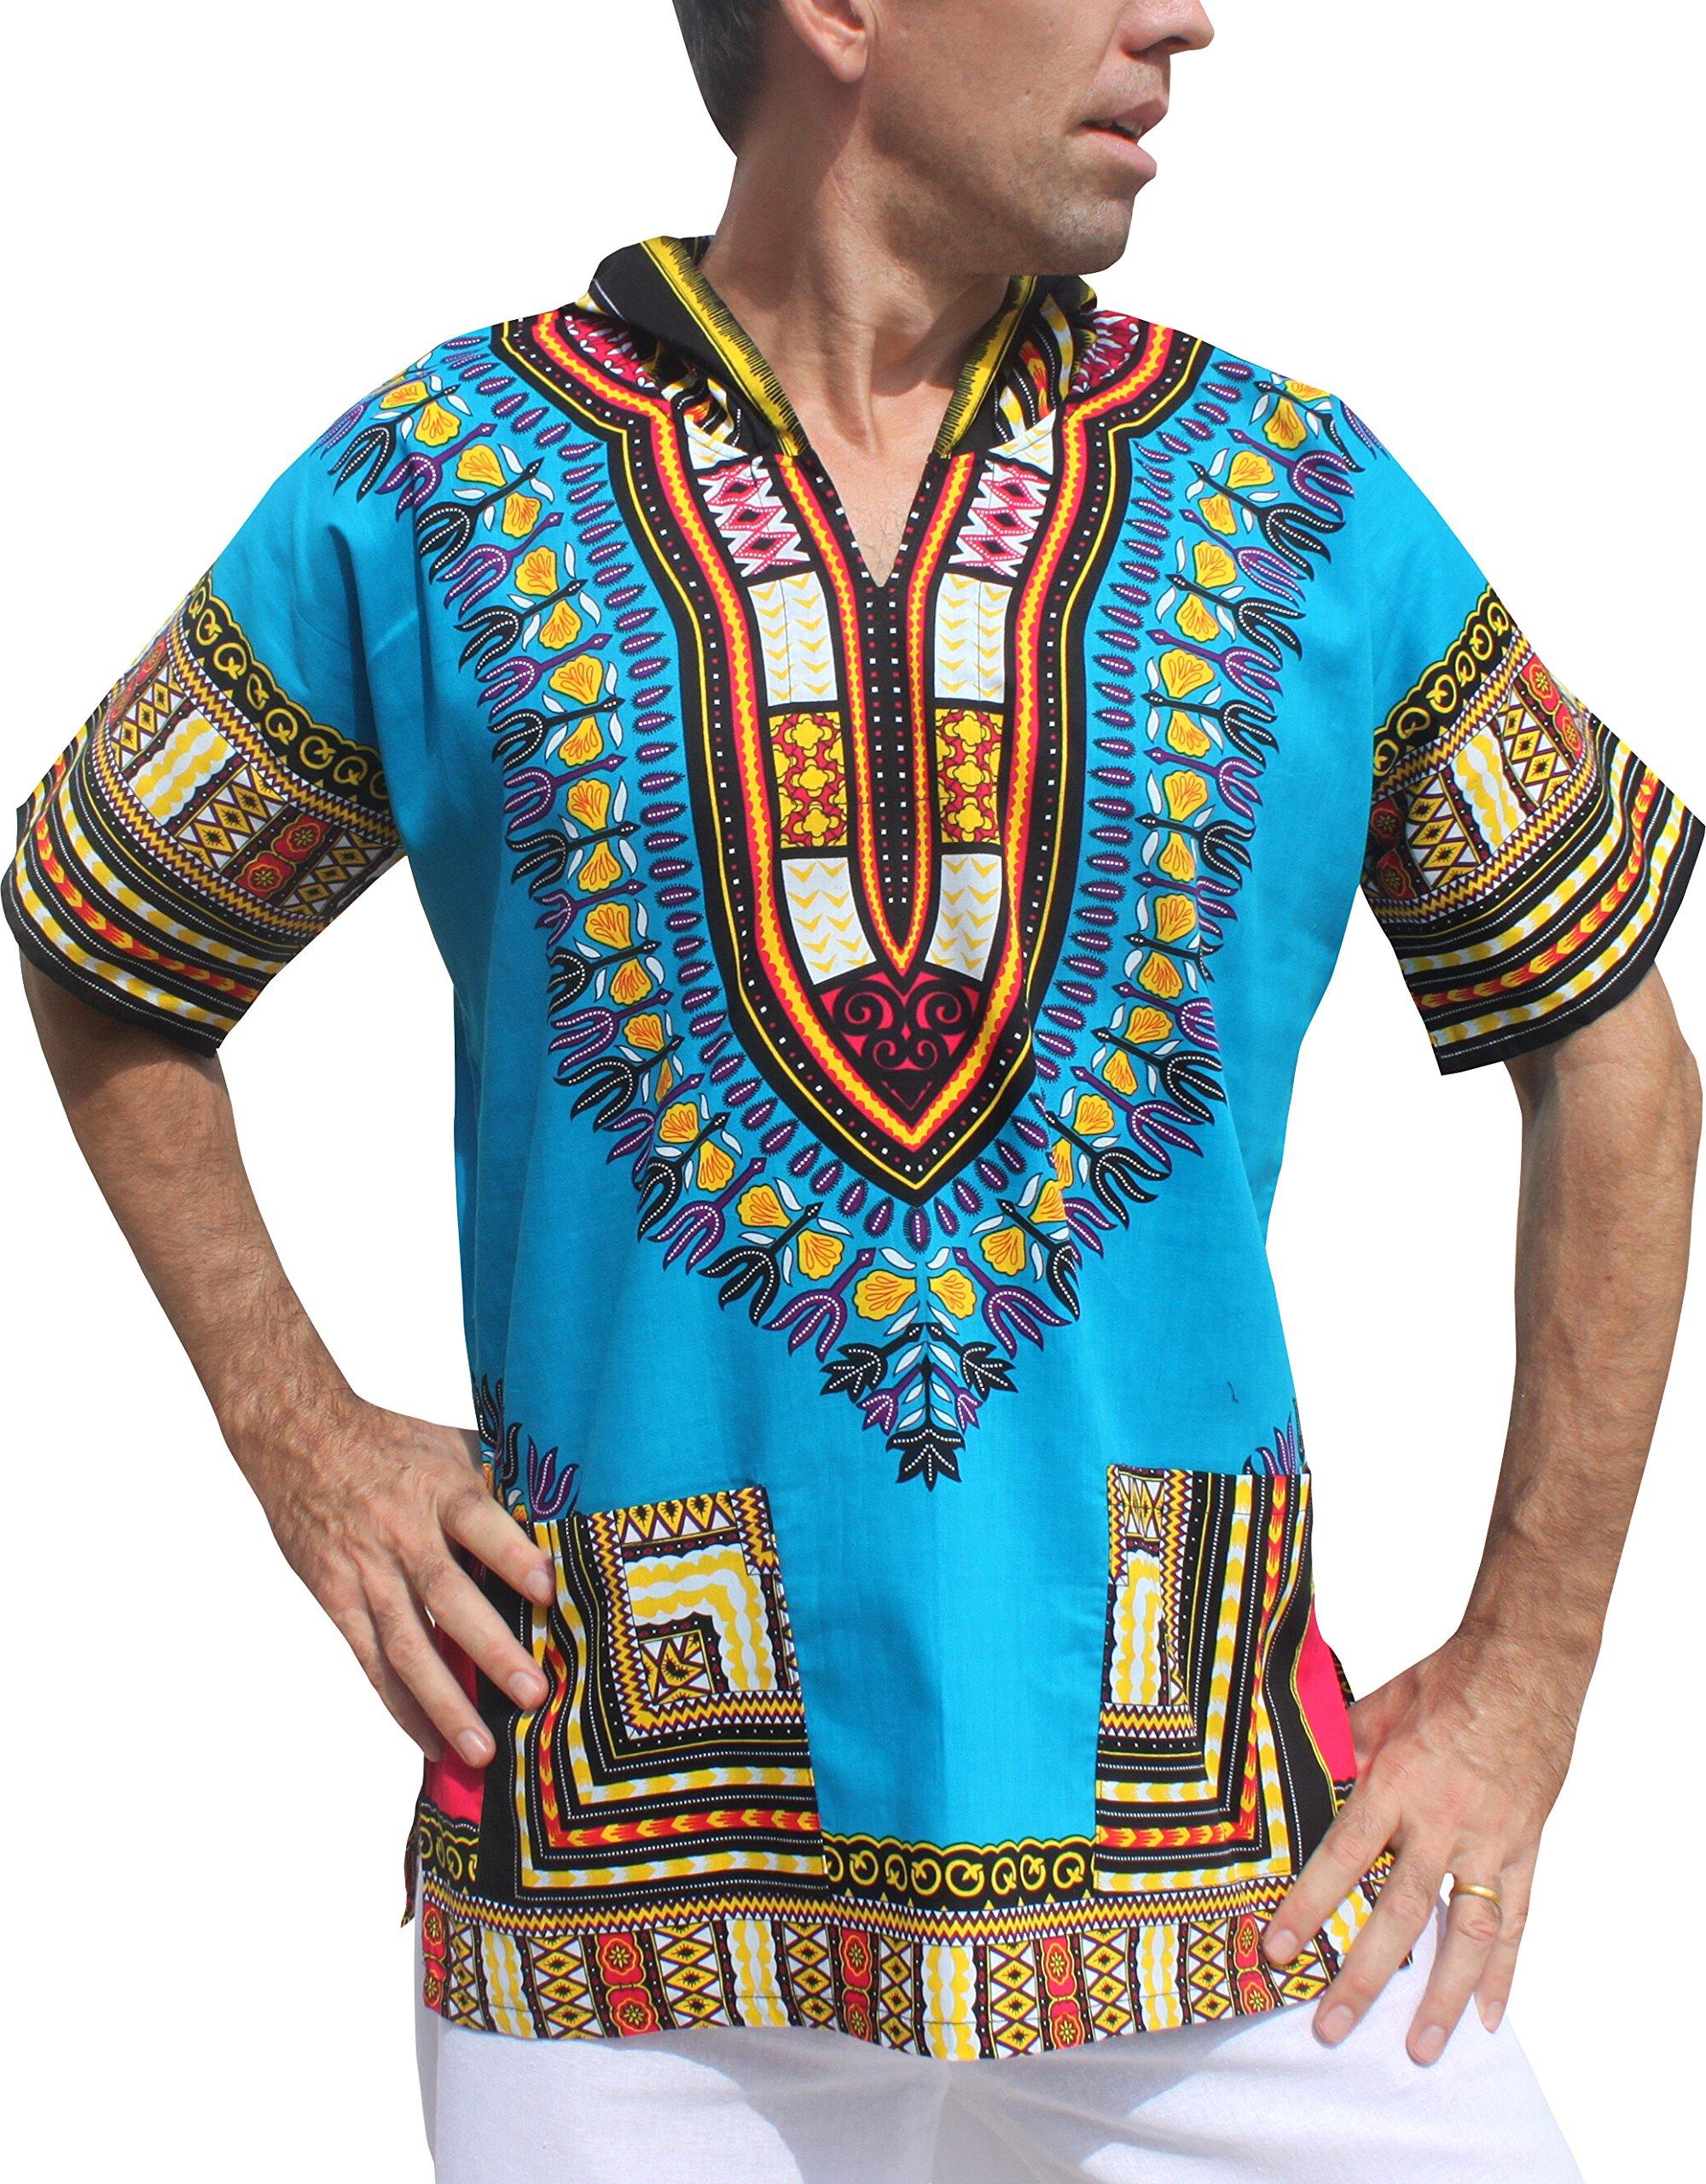 Full Funk Dashiki Light Hoody In Bright Colors Festival Party Shirt Short Sleeve, Medium, Dodger Blue